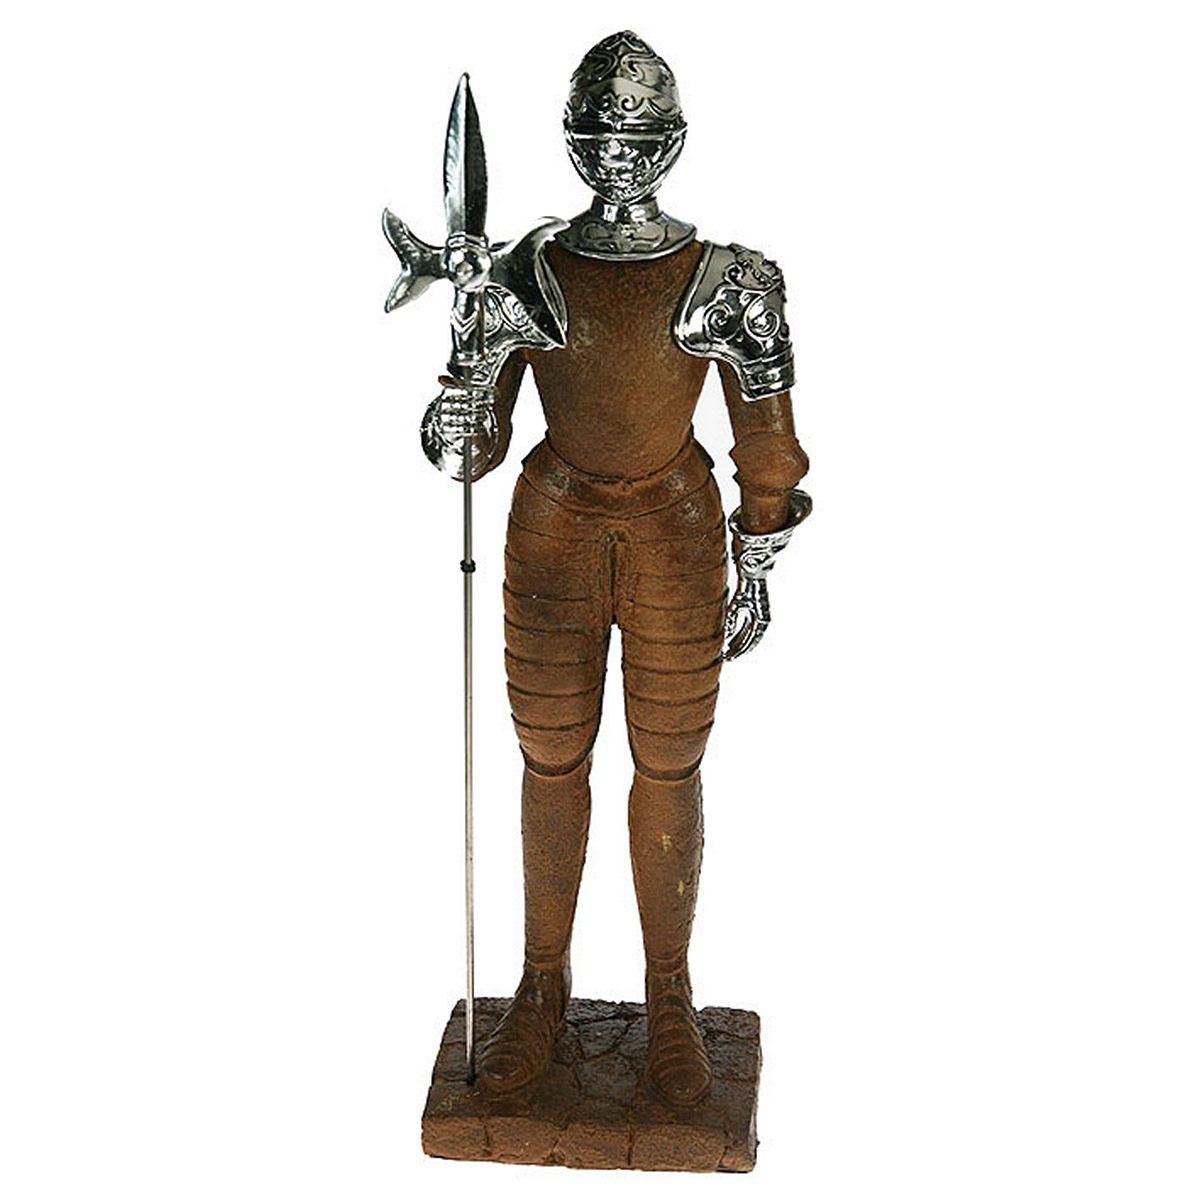 Статуэтка Русские Подарки Рыцарь, 18 х 12 х 54 см статуэтка русские подарки мисс утонченность 12 х 10 х 34 см